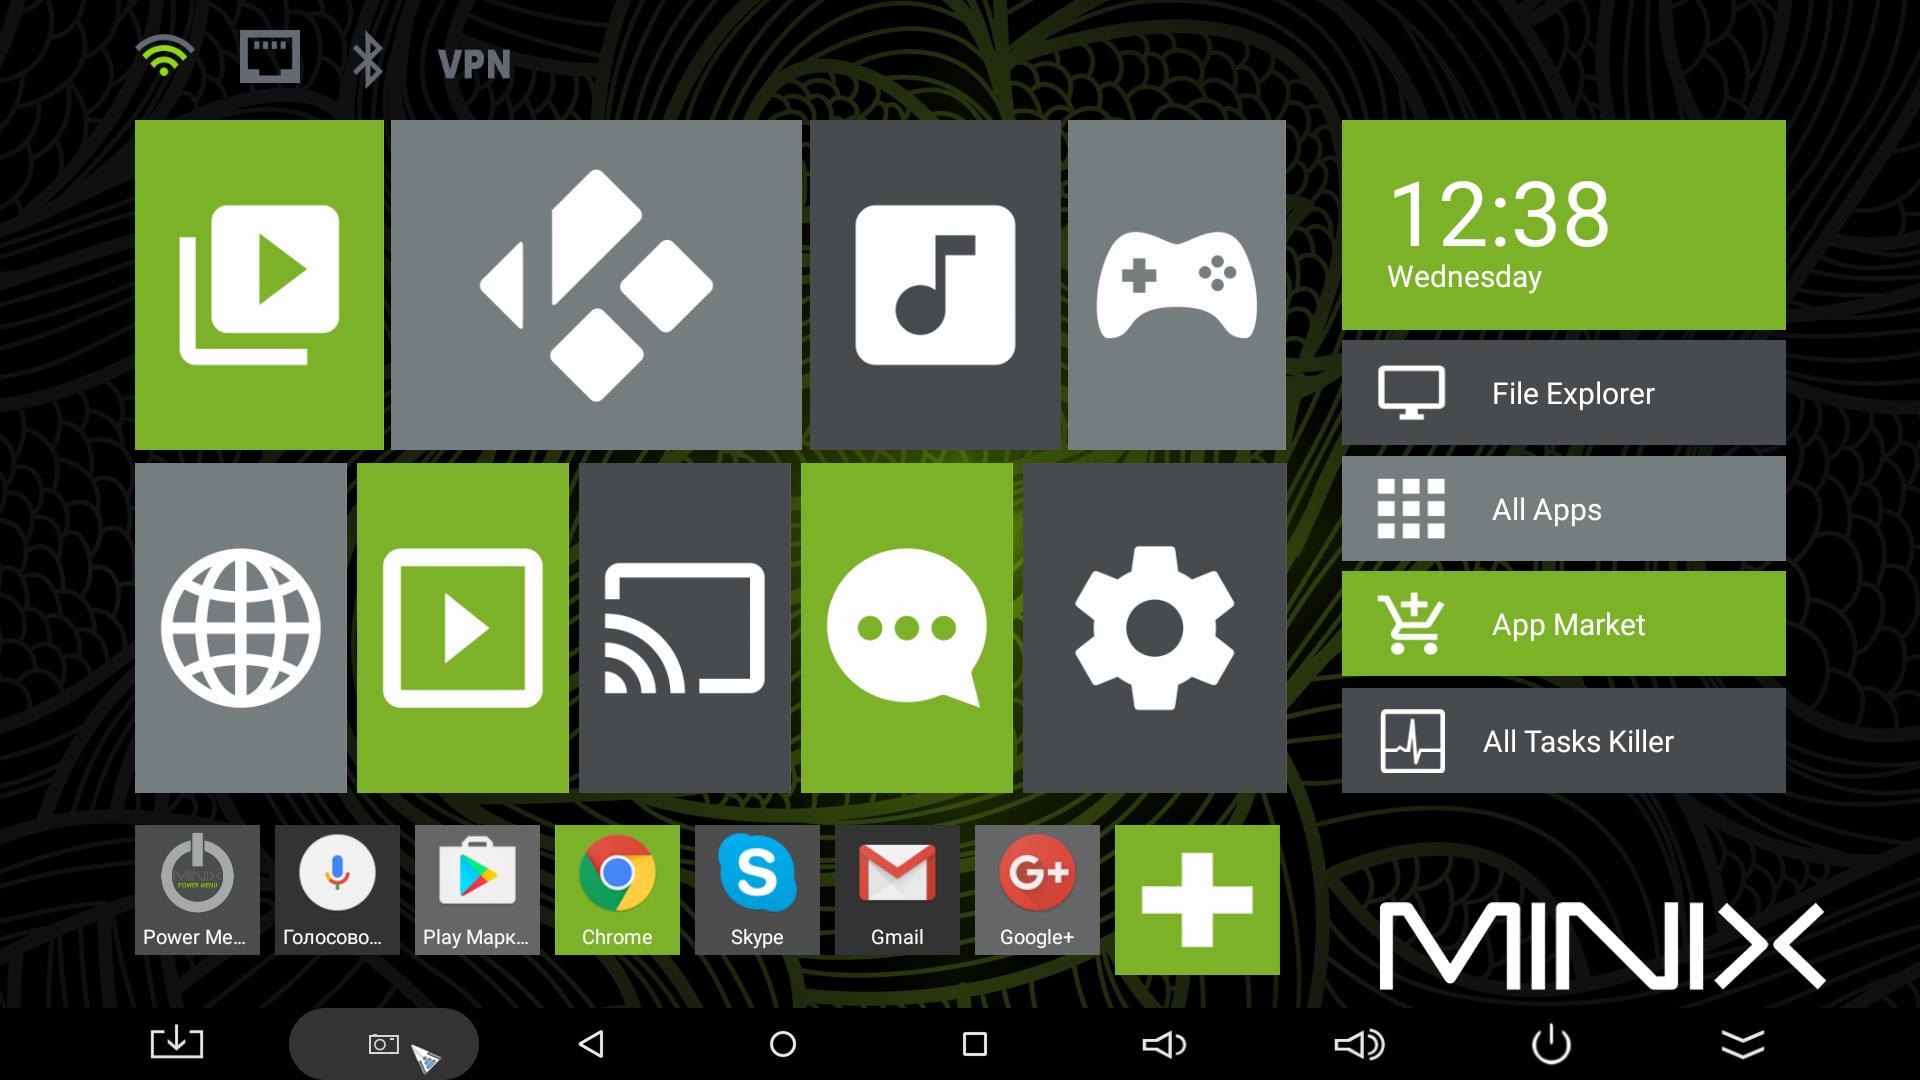 Интерфейс Android-медиаплеера MINIX NEO U1